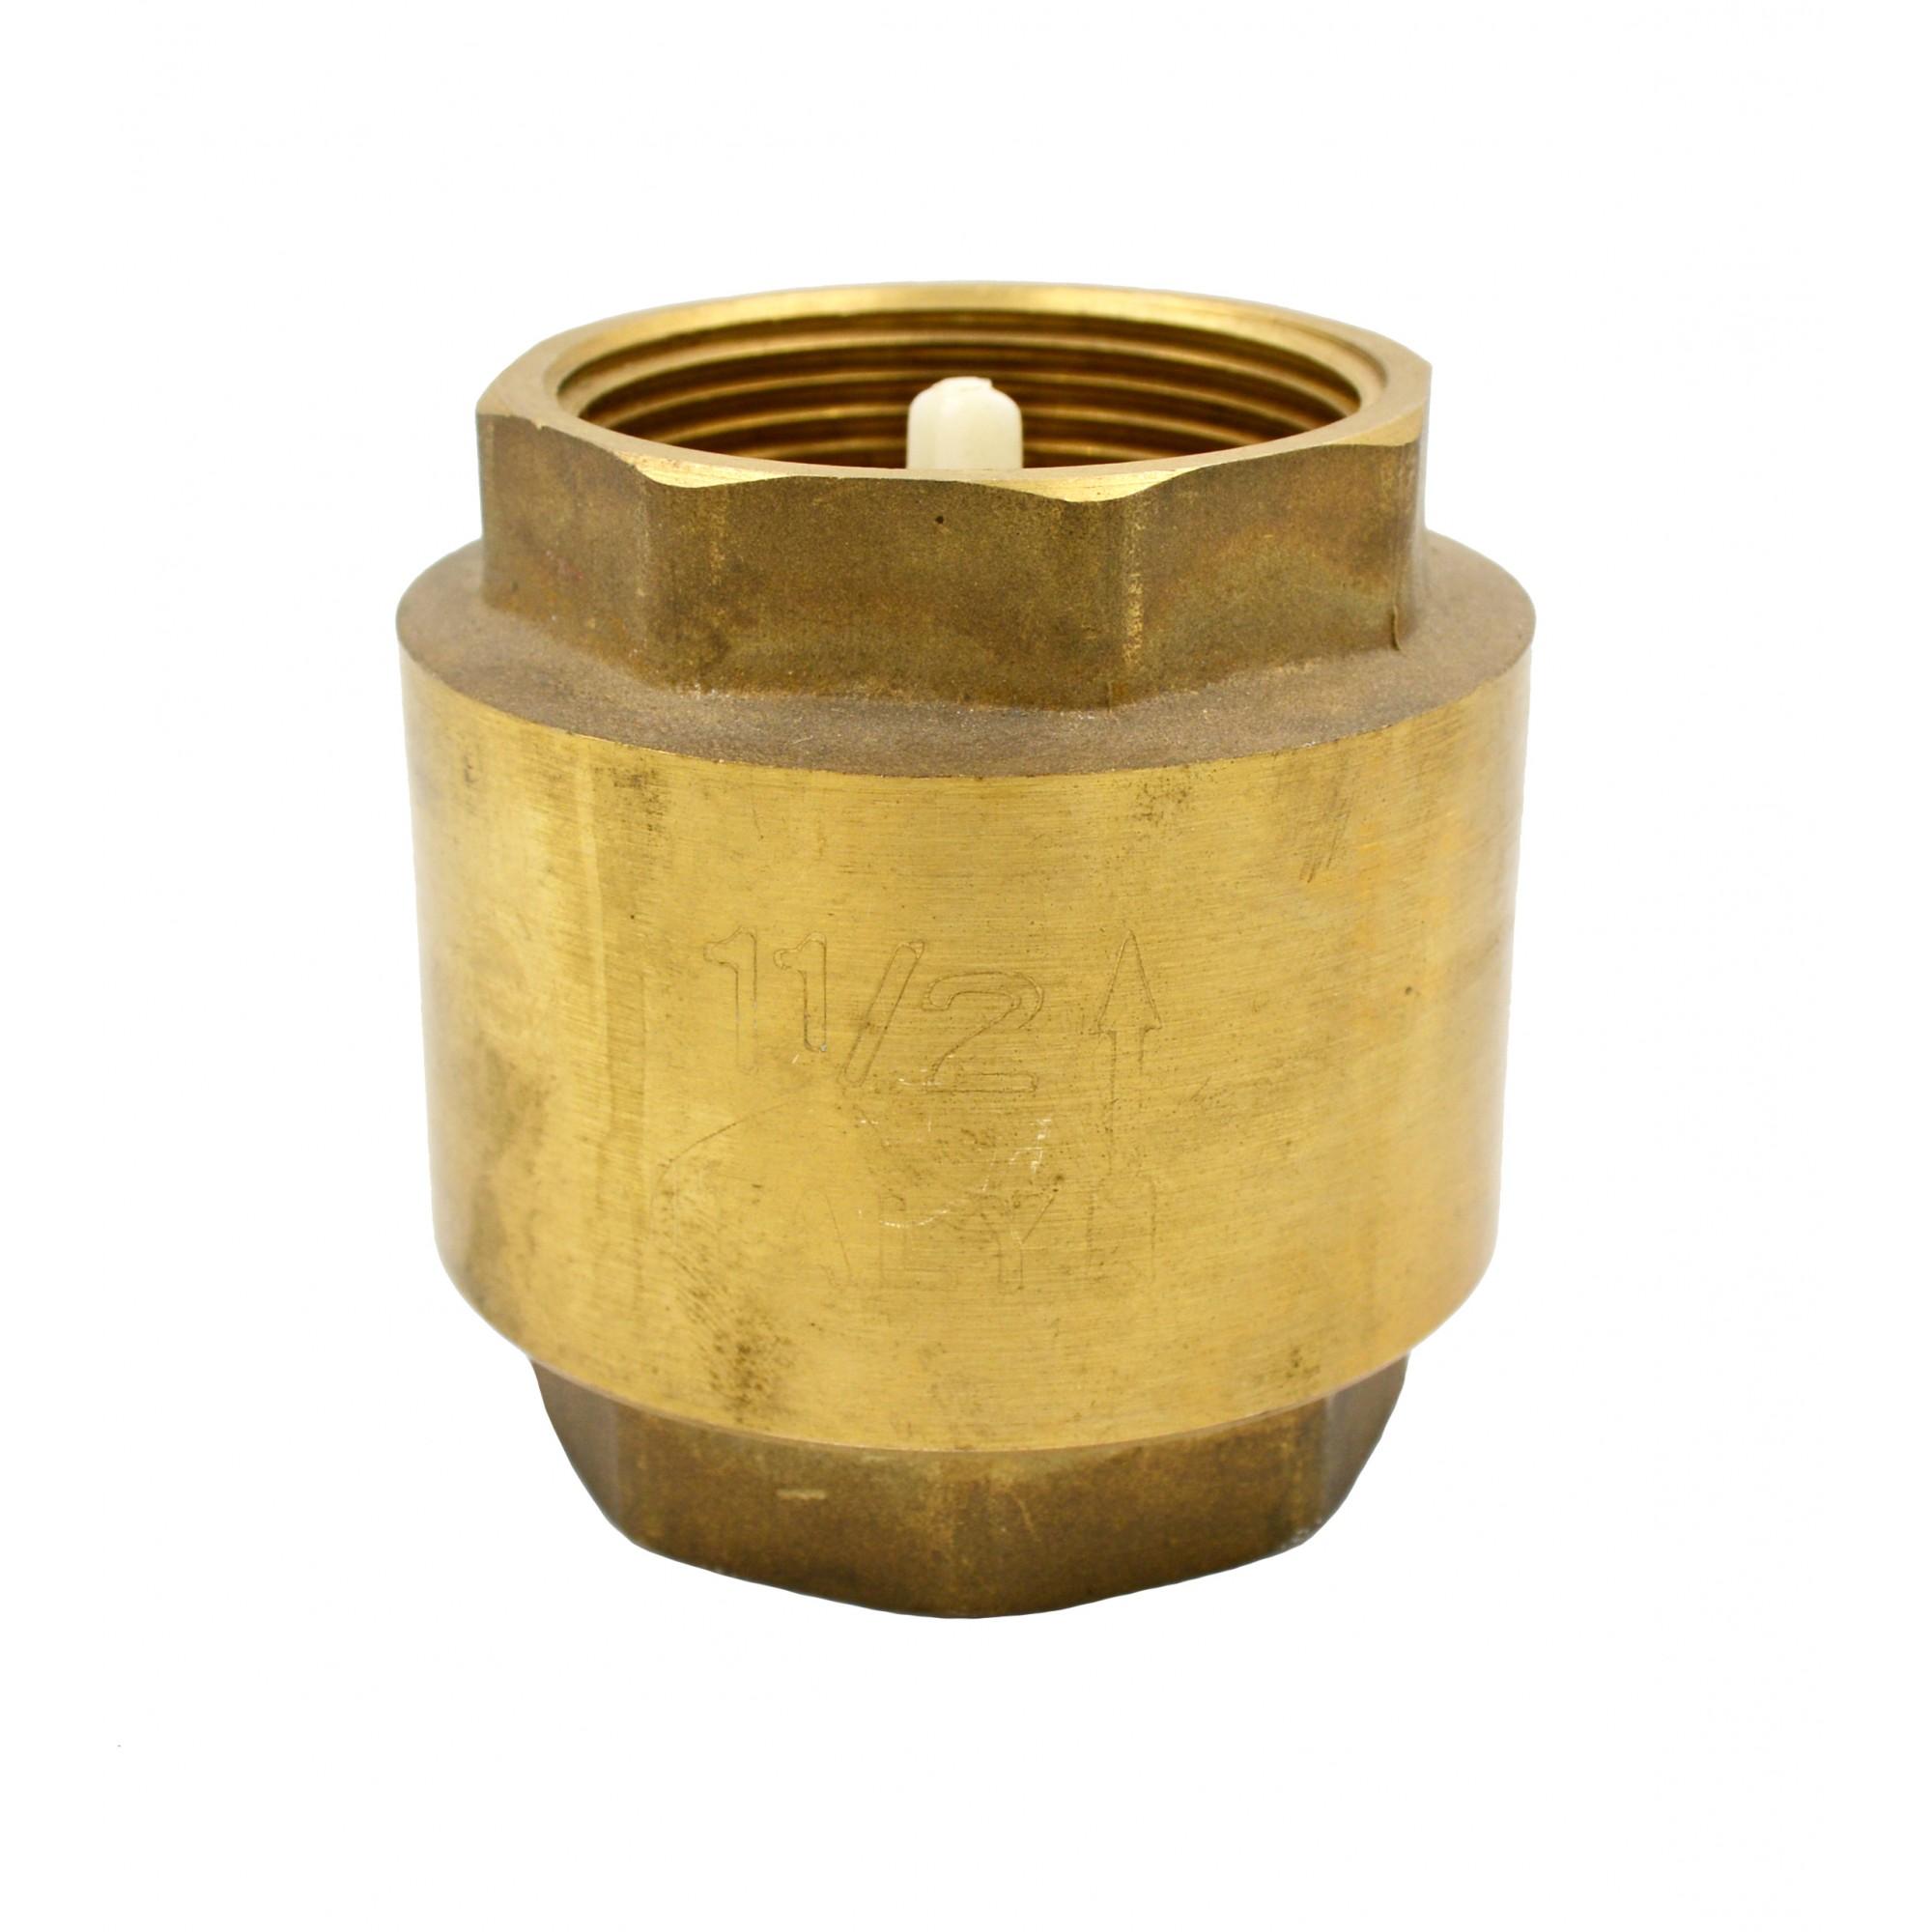 "Обратный клапан 1""1/2 J.G. пластиковый шток J.G."